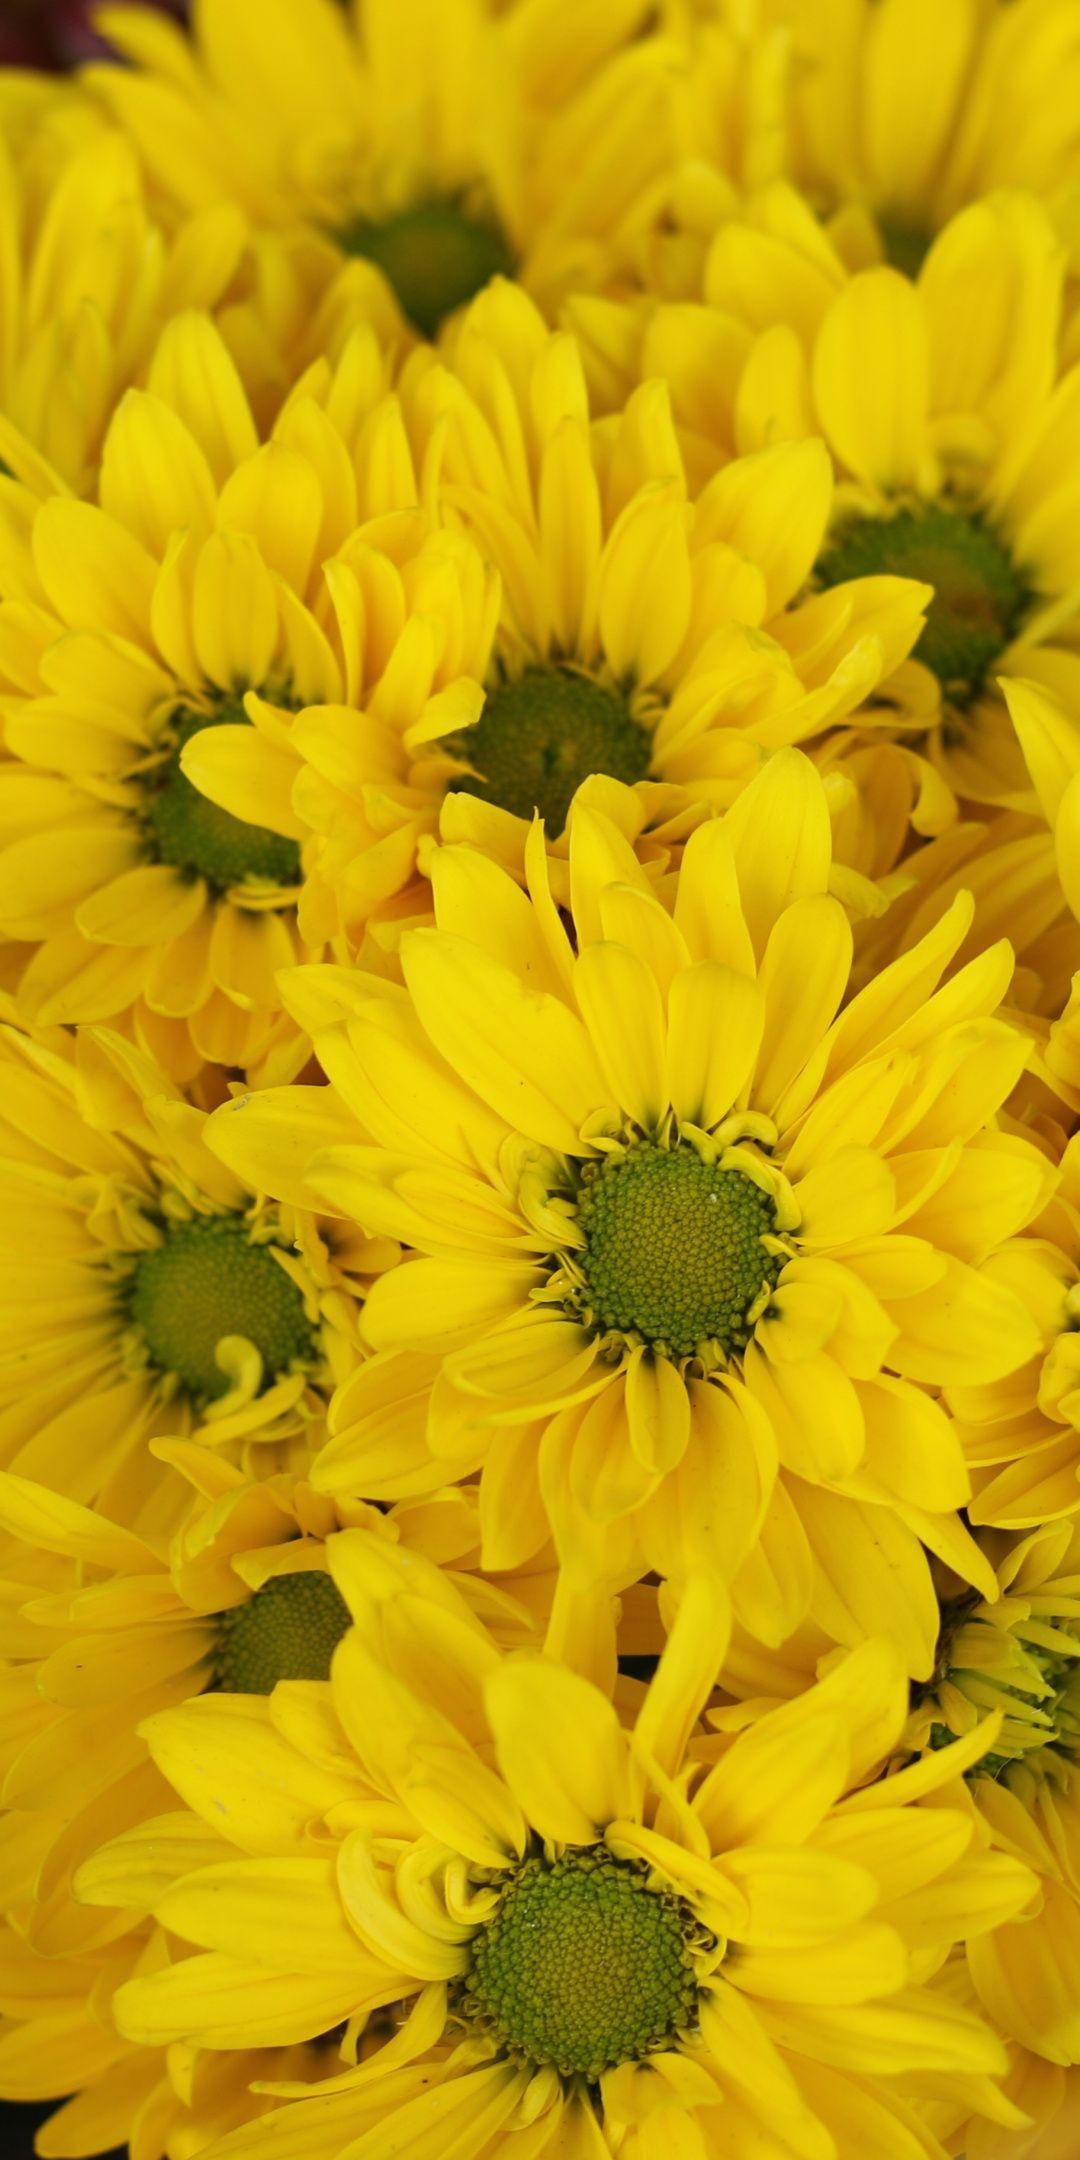 Yellow Flowers Gerbera Basket Bloom 1080x2160 Wallpaper Yellow Flower Wallpaper Yellow Flowers Yellow Wallpaper